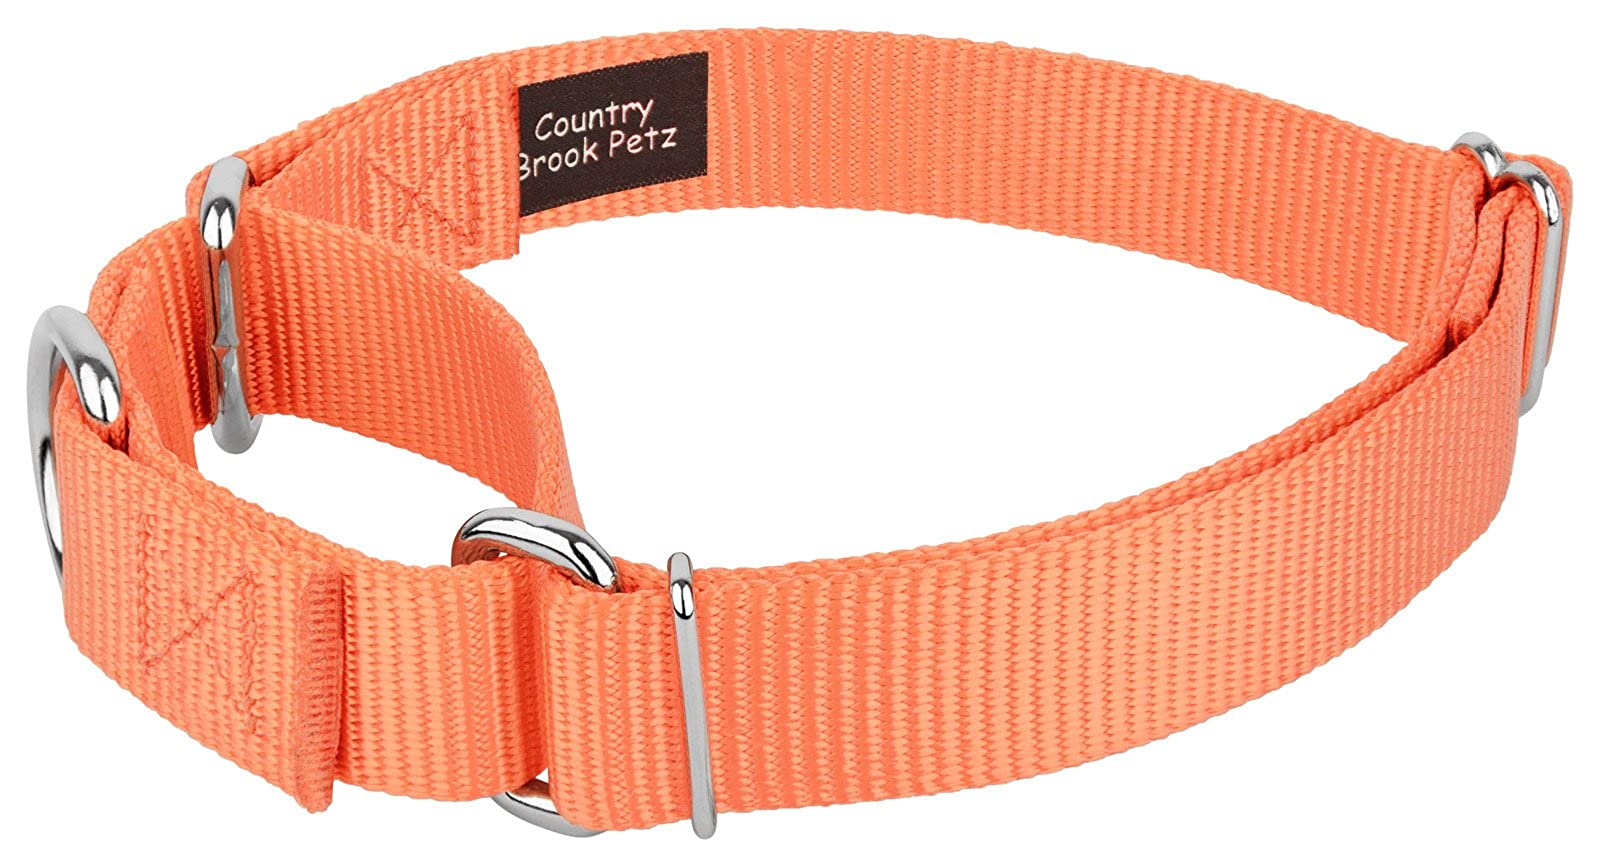 Country Brook Design | Martingale Heavyduty Nylon Dog - 2